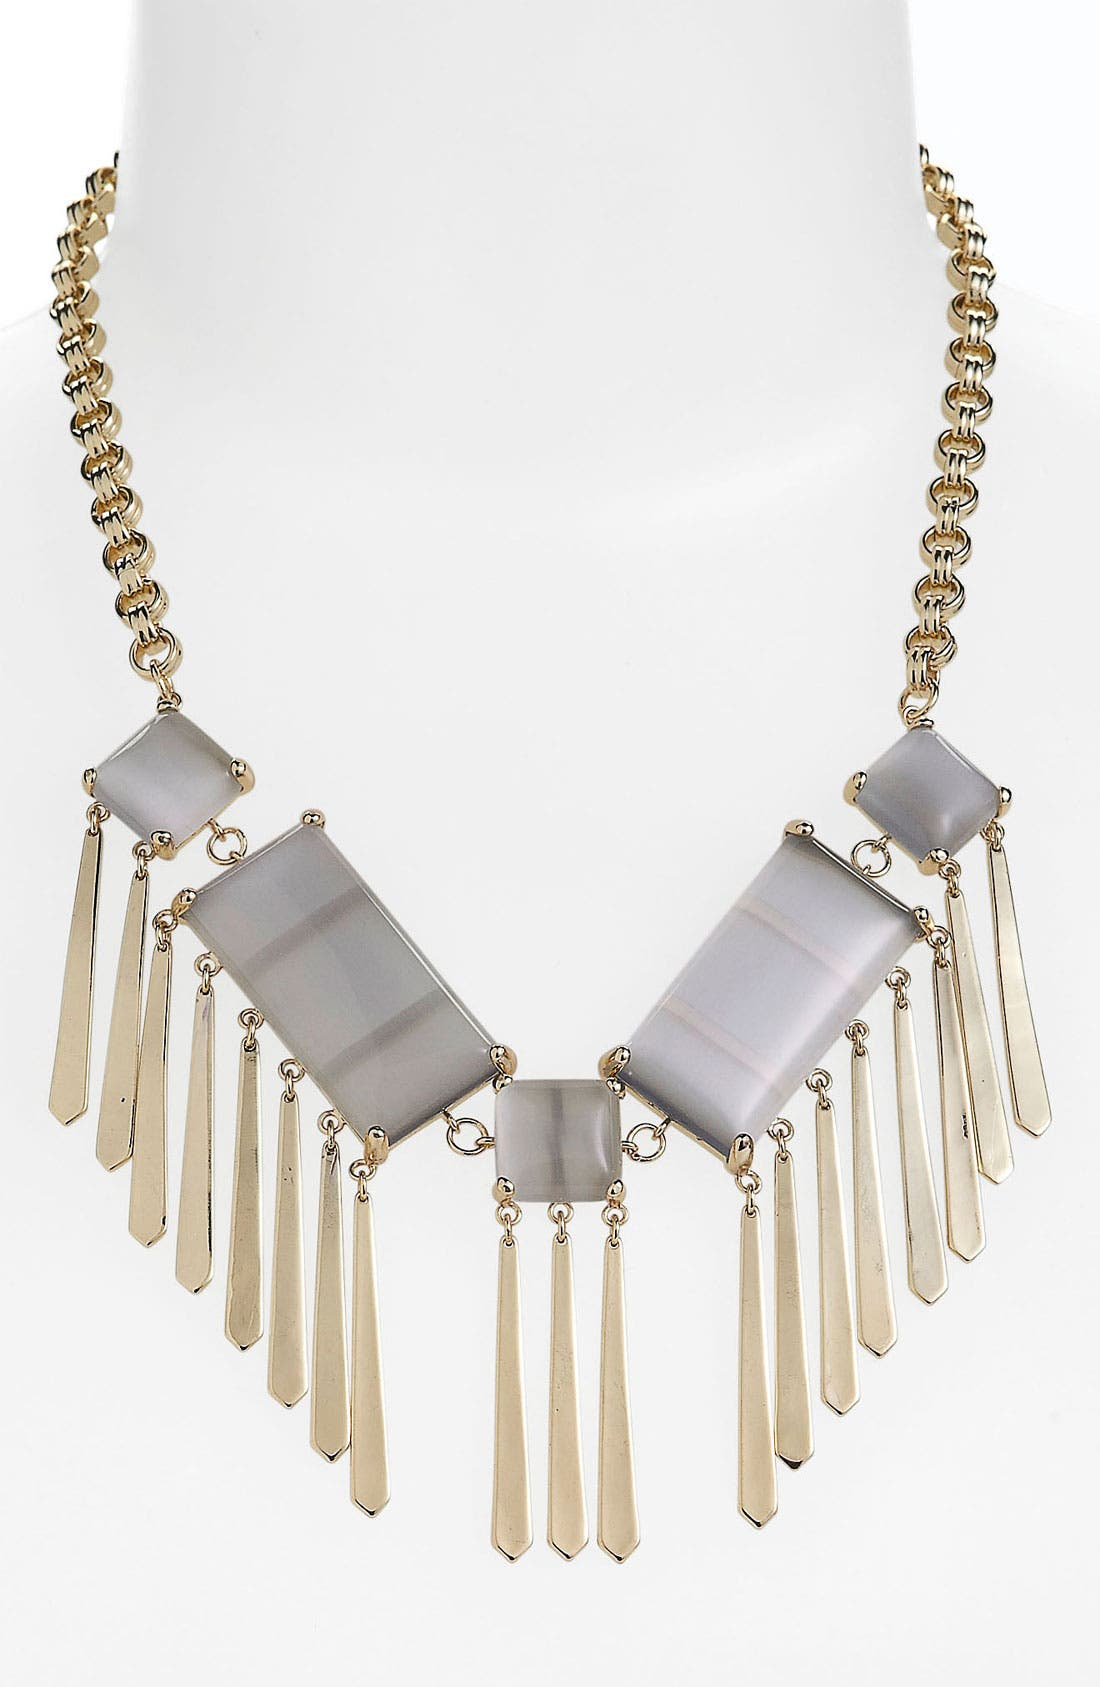 Alternate Image 1 Selected - Kendra Scott 'Leandra' Bib Necklace